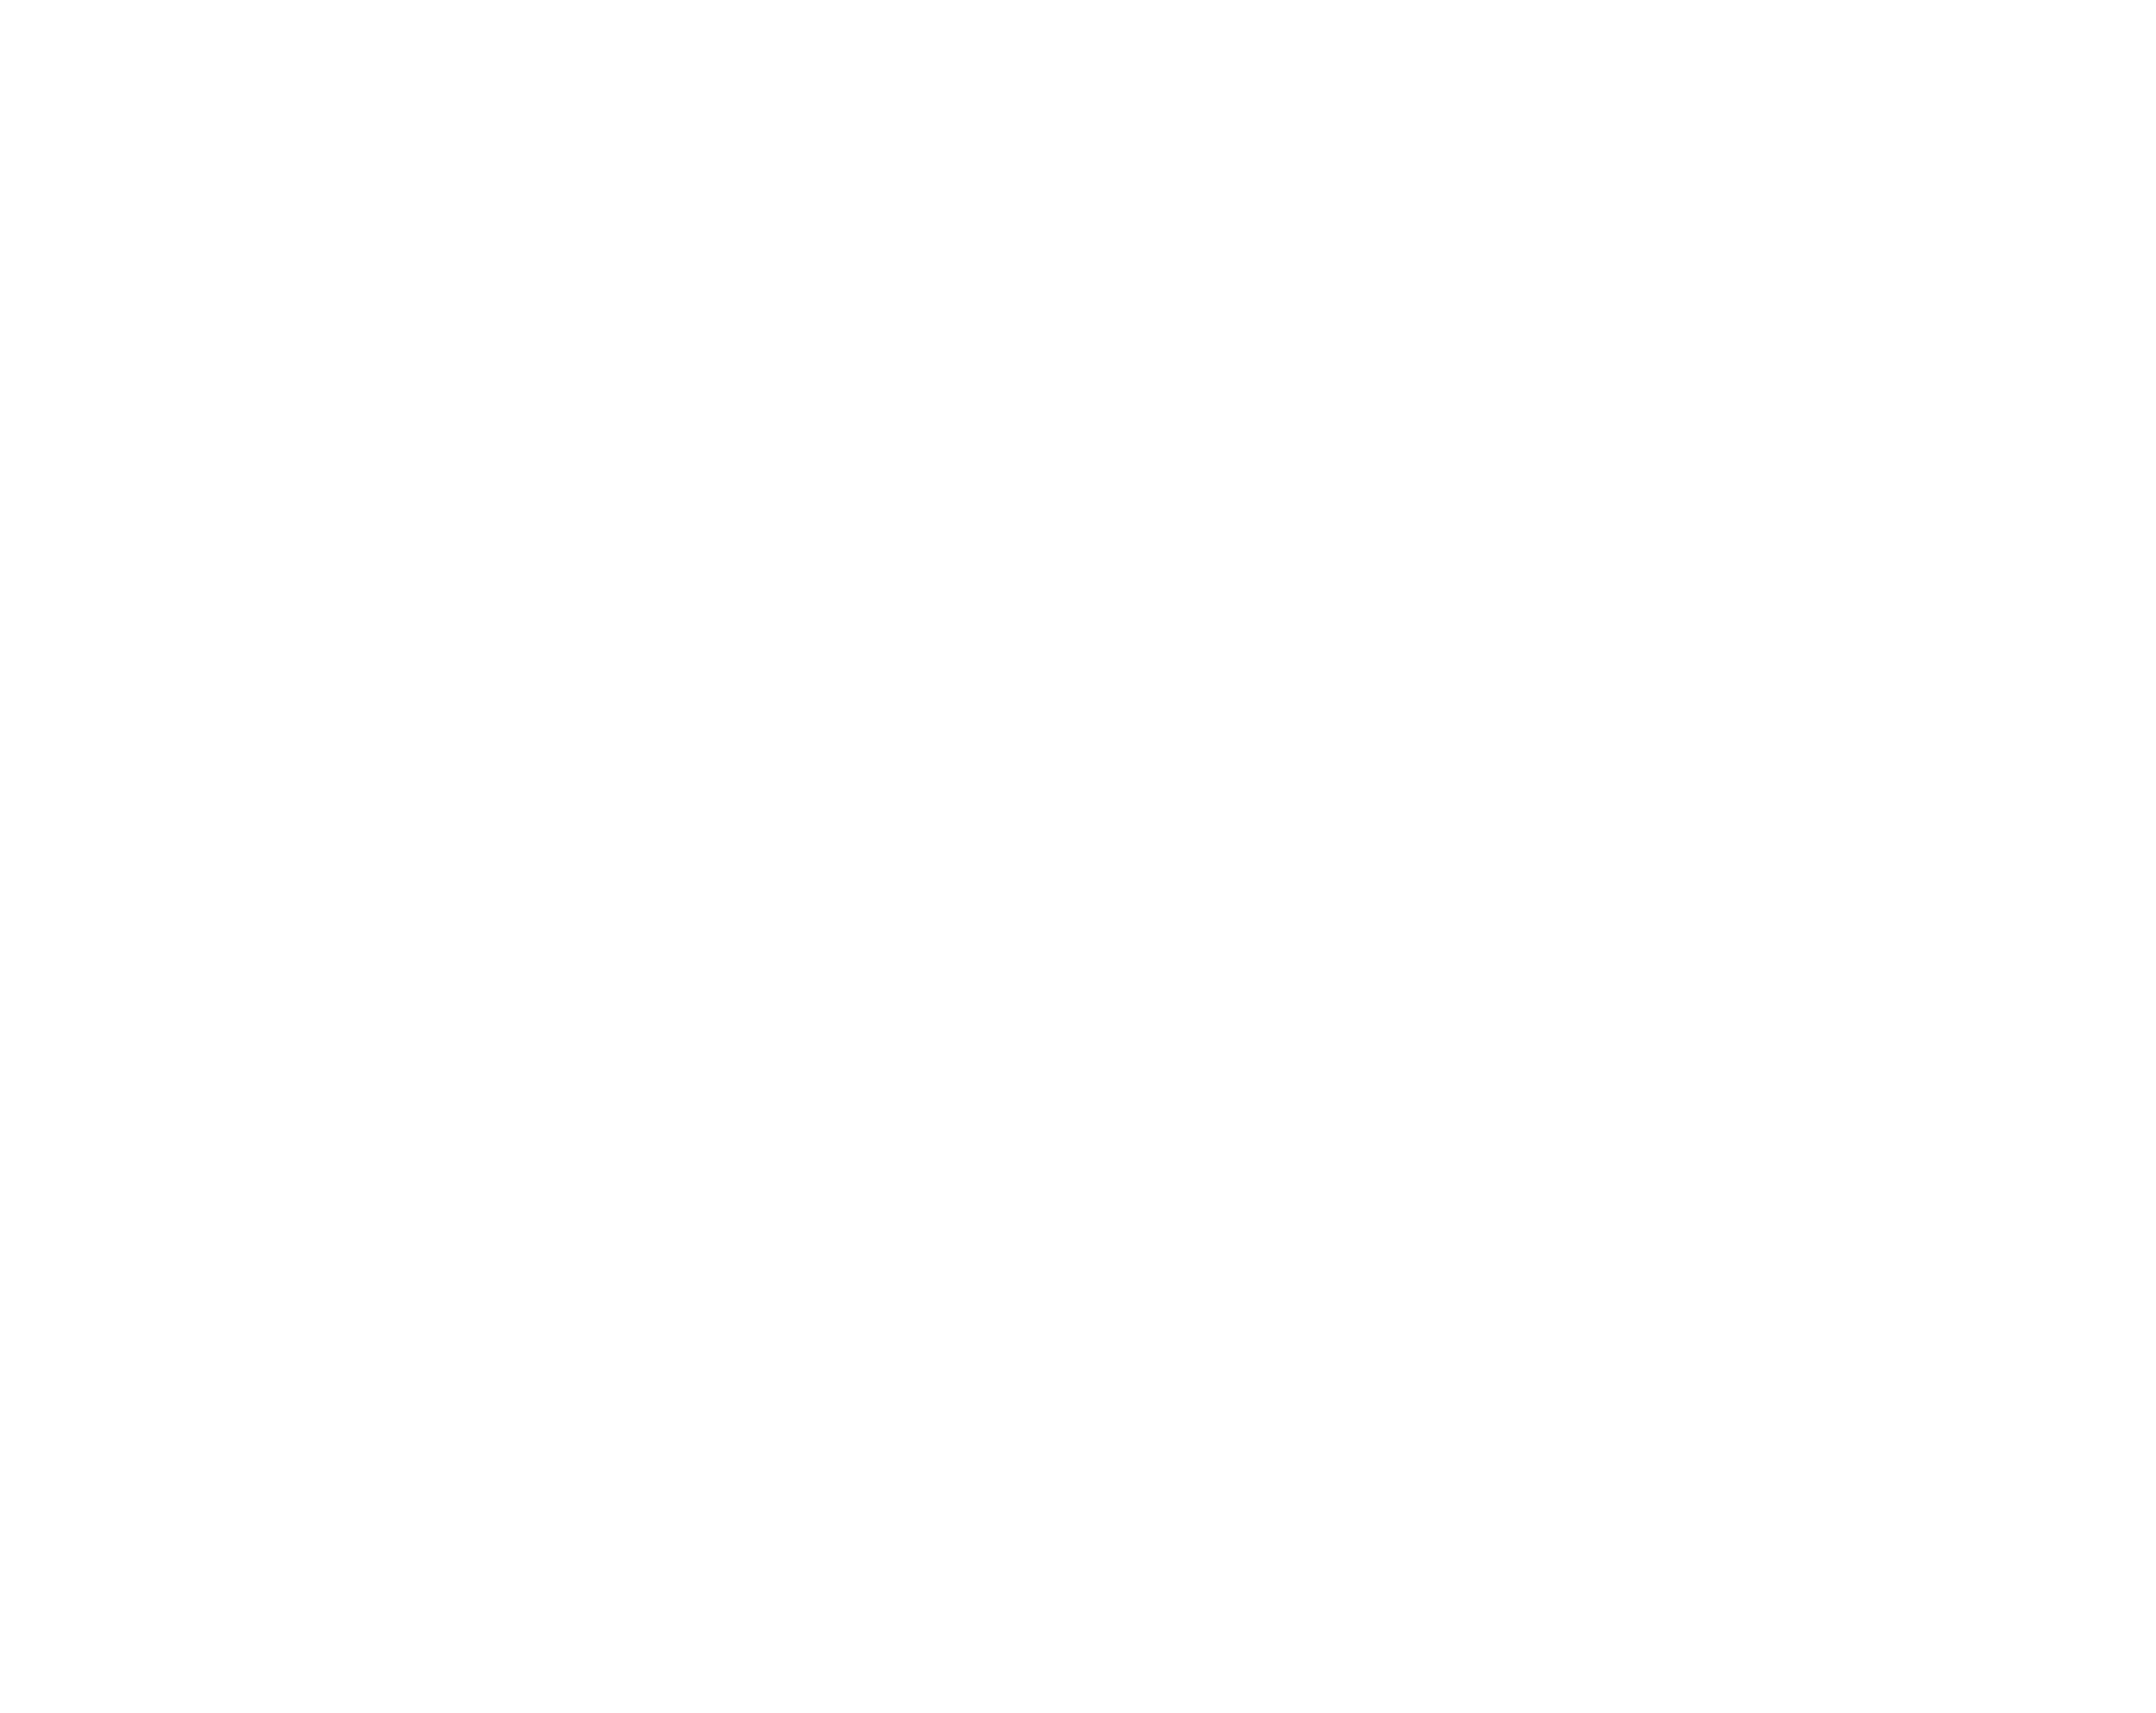 Smart Sol Technologies